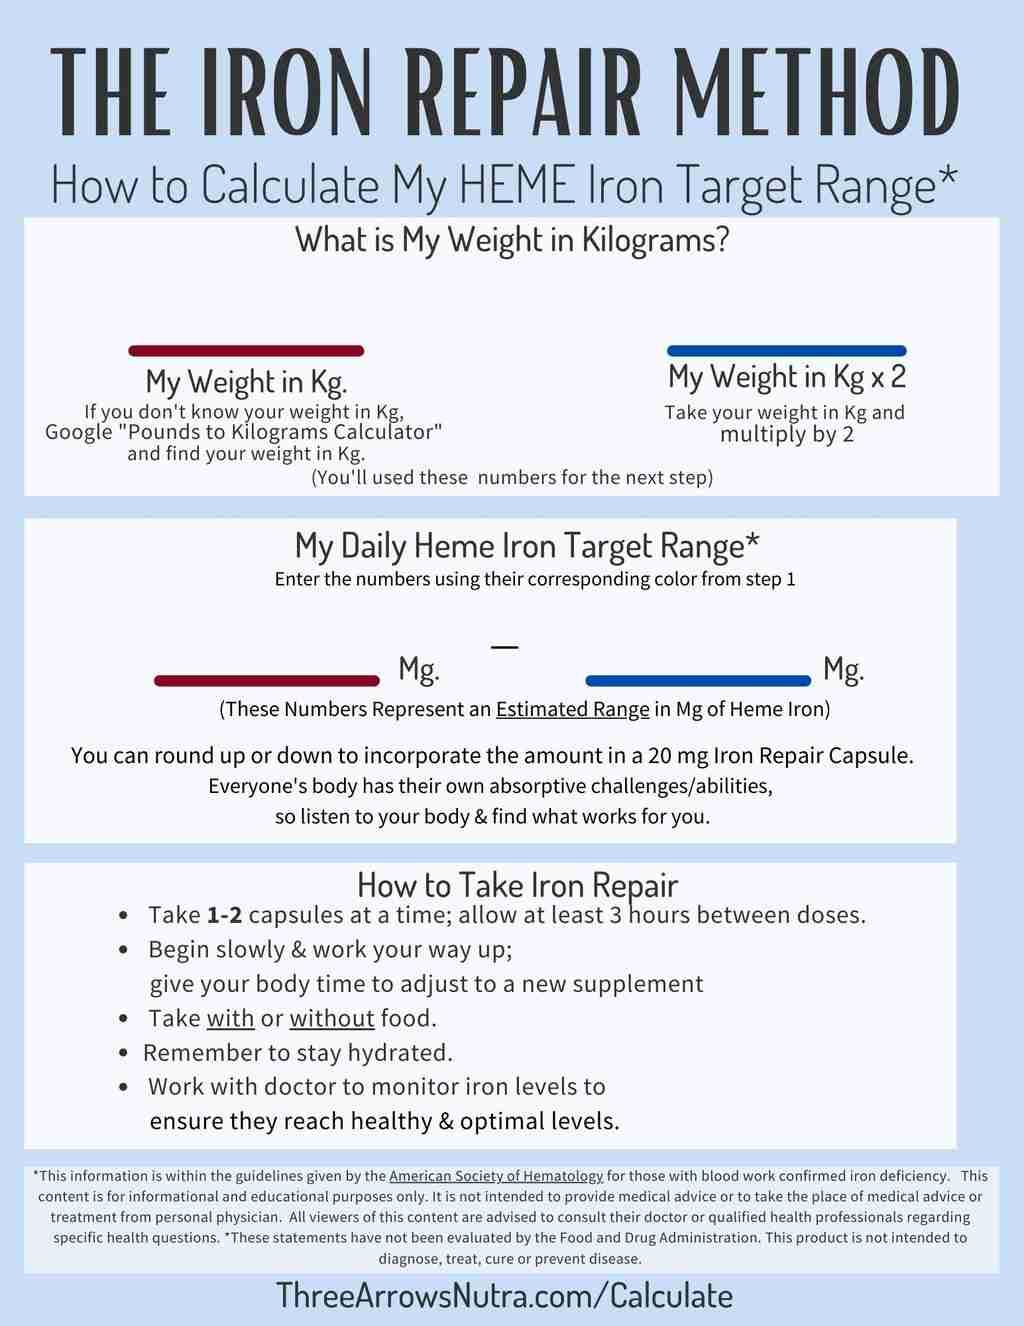 How Much Iron Repair Should I take? How to take heme iron